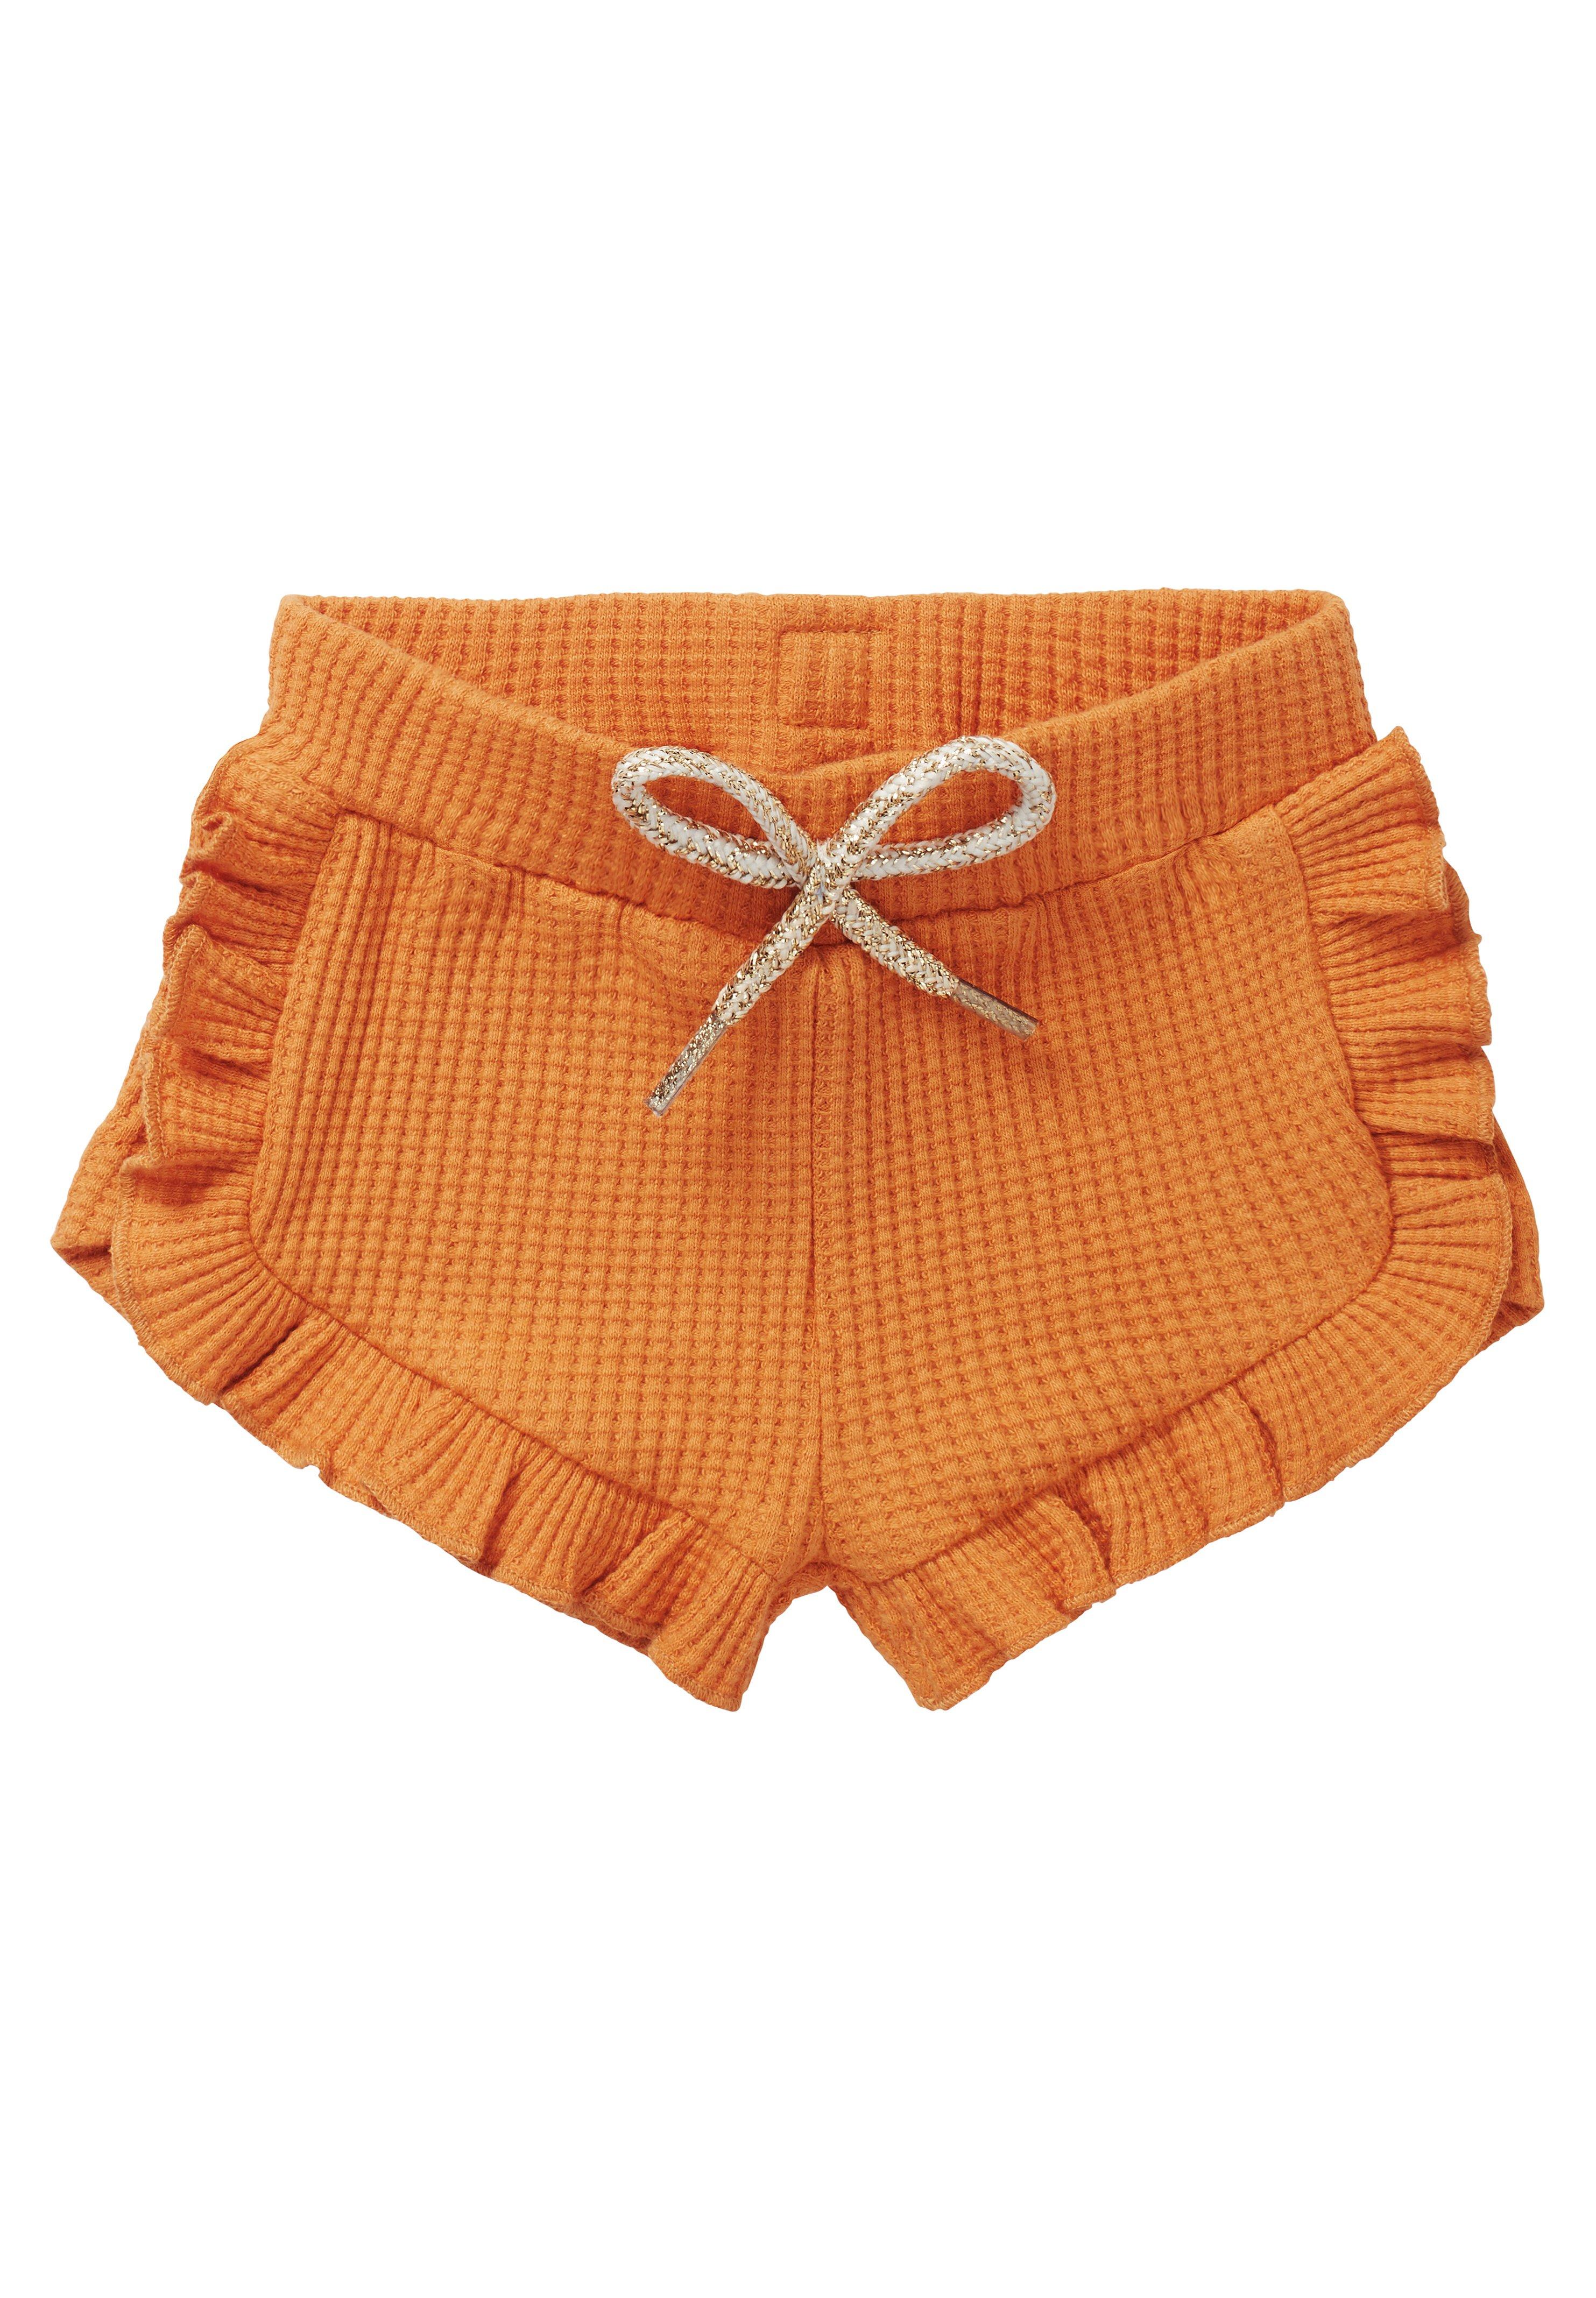 Bambini MERFY - SHORTS - Shorts